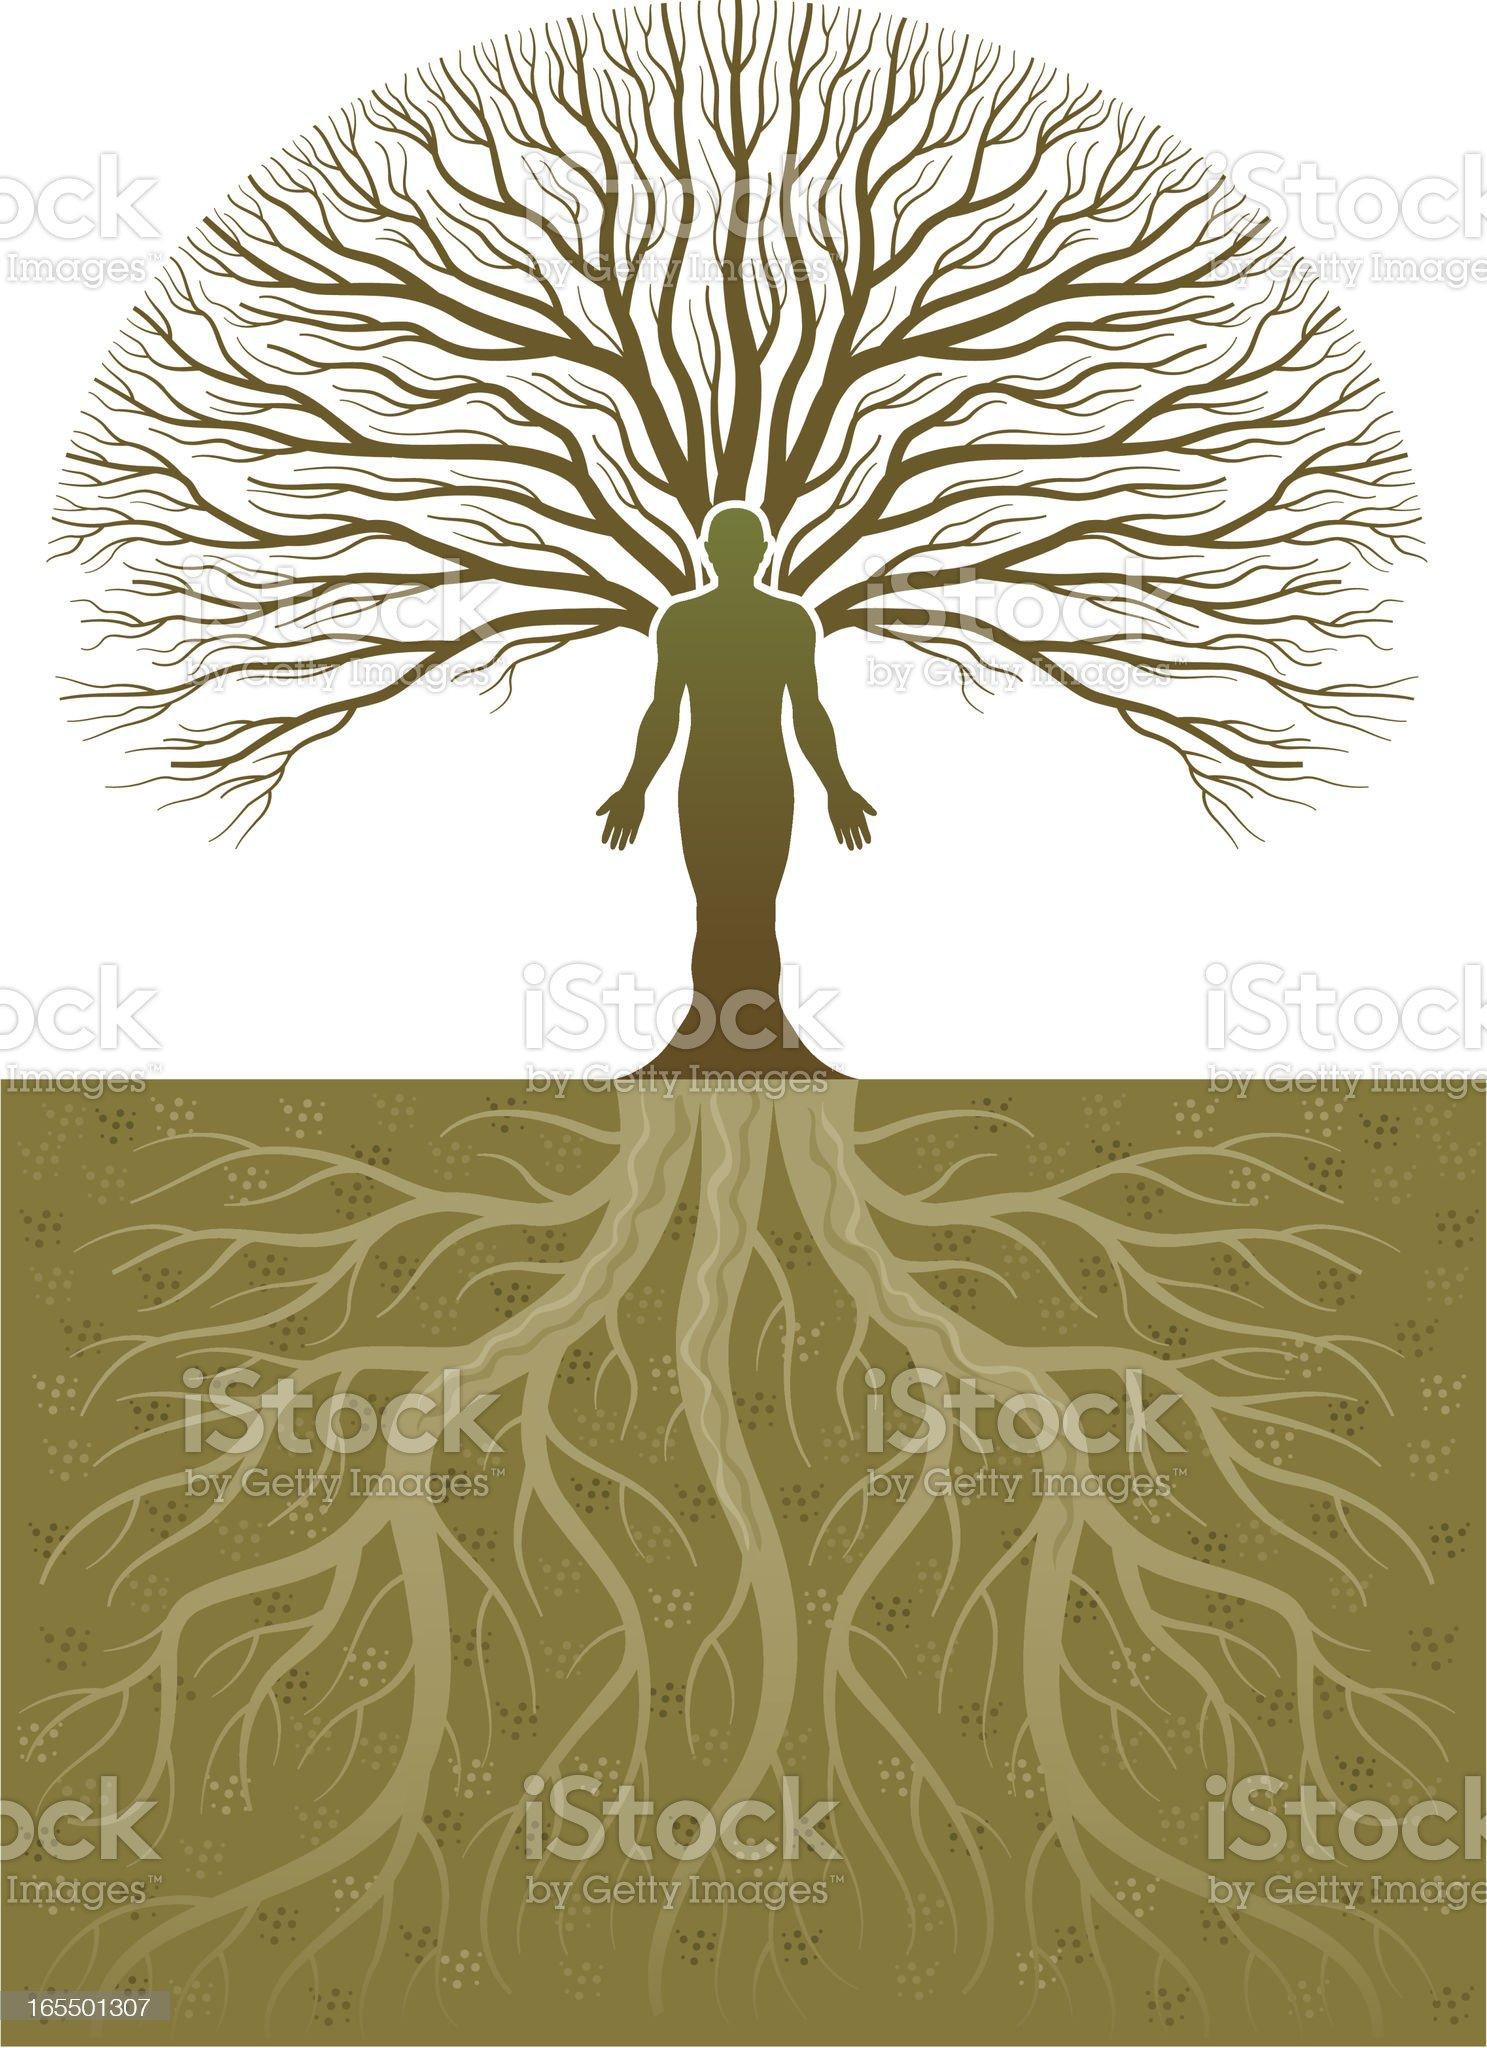 Treeman and roots royalty-free stock vector art